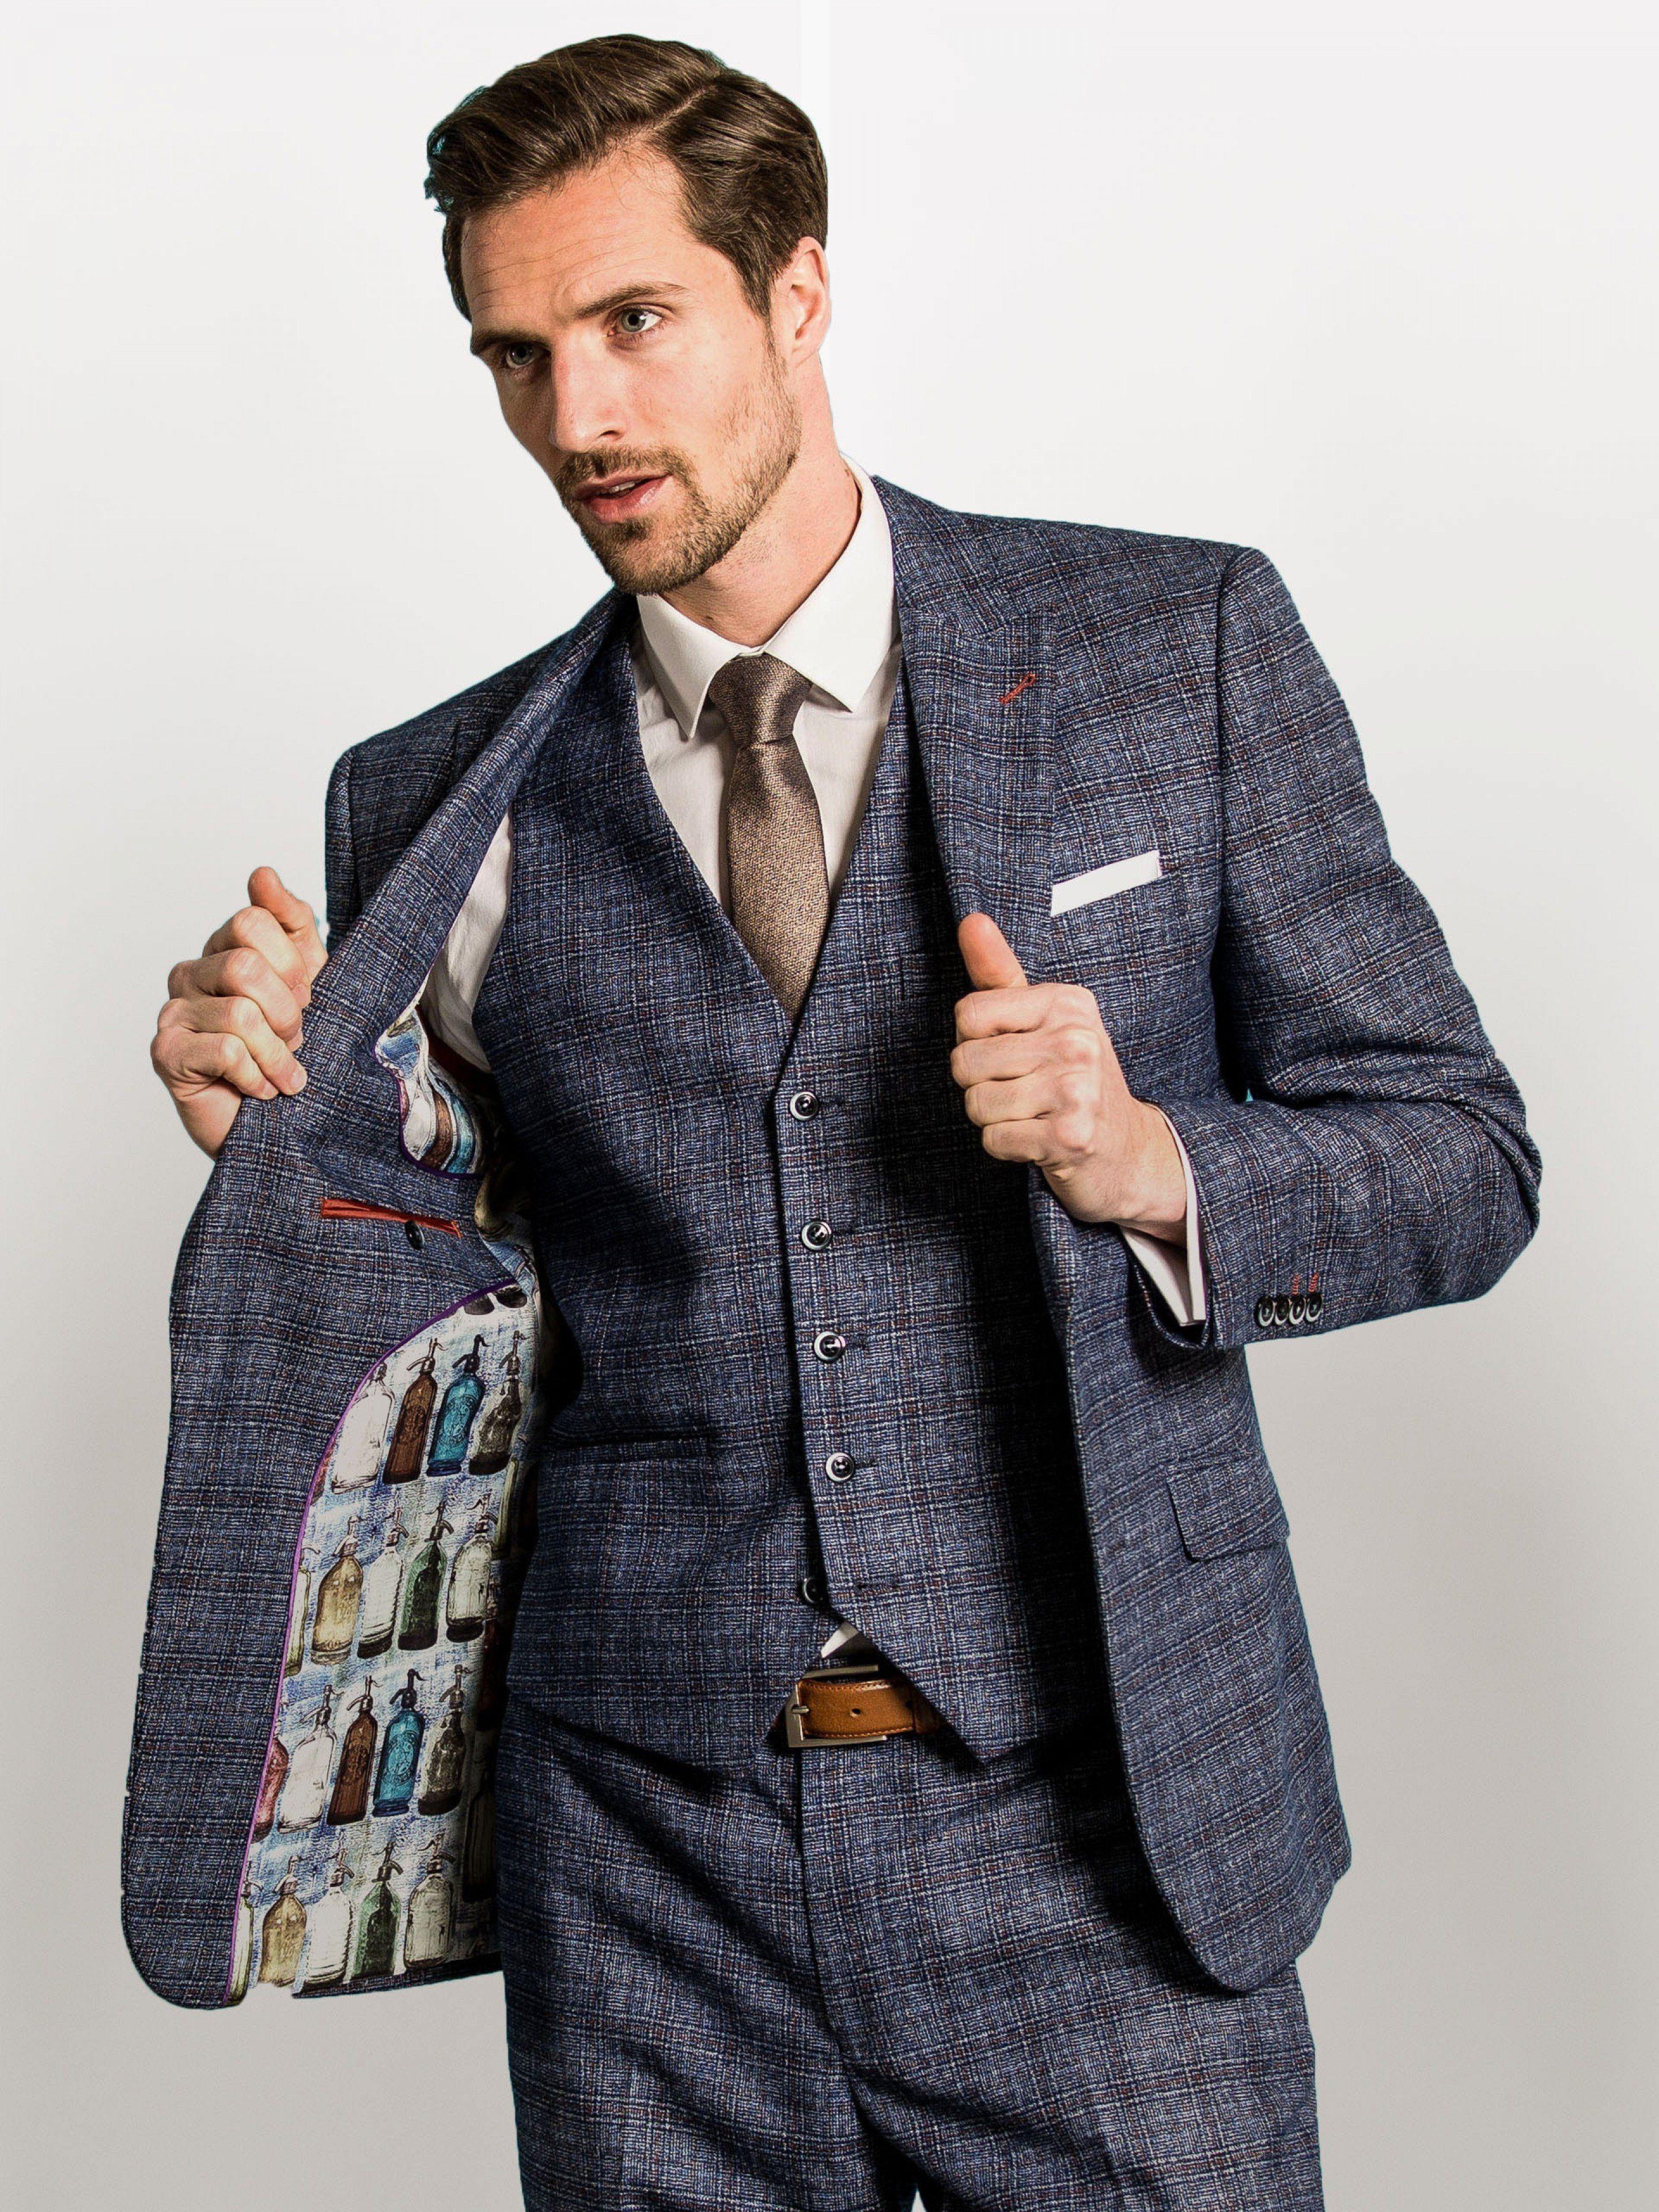 df6f79c0ad355d OneSix5ive Luxury Blue Check Three Piece Slim Fit Suit | Trajes ...